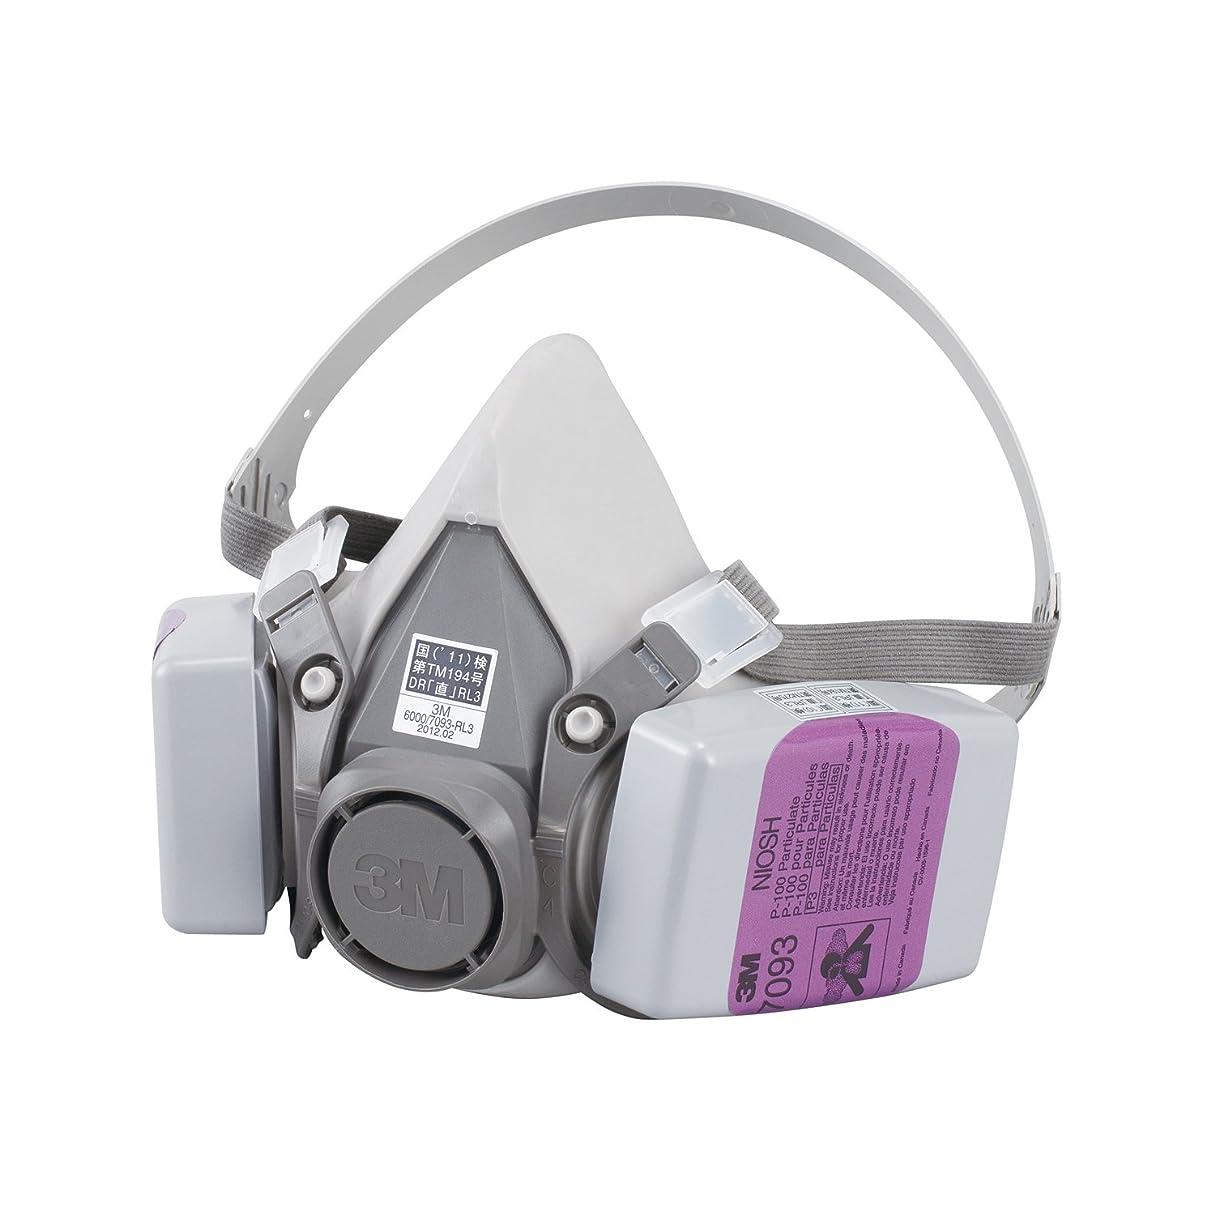 3M 取替え式防じんマスク 6000/7093-RL3 ラージ 6000/7093-RL3 L